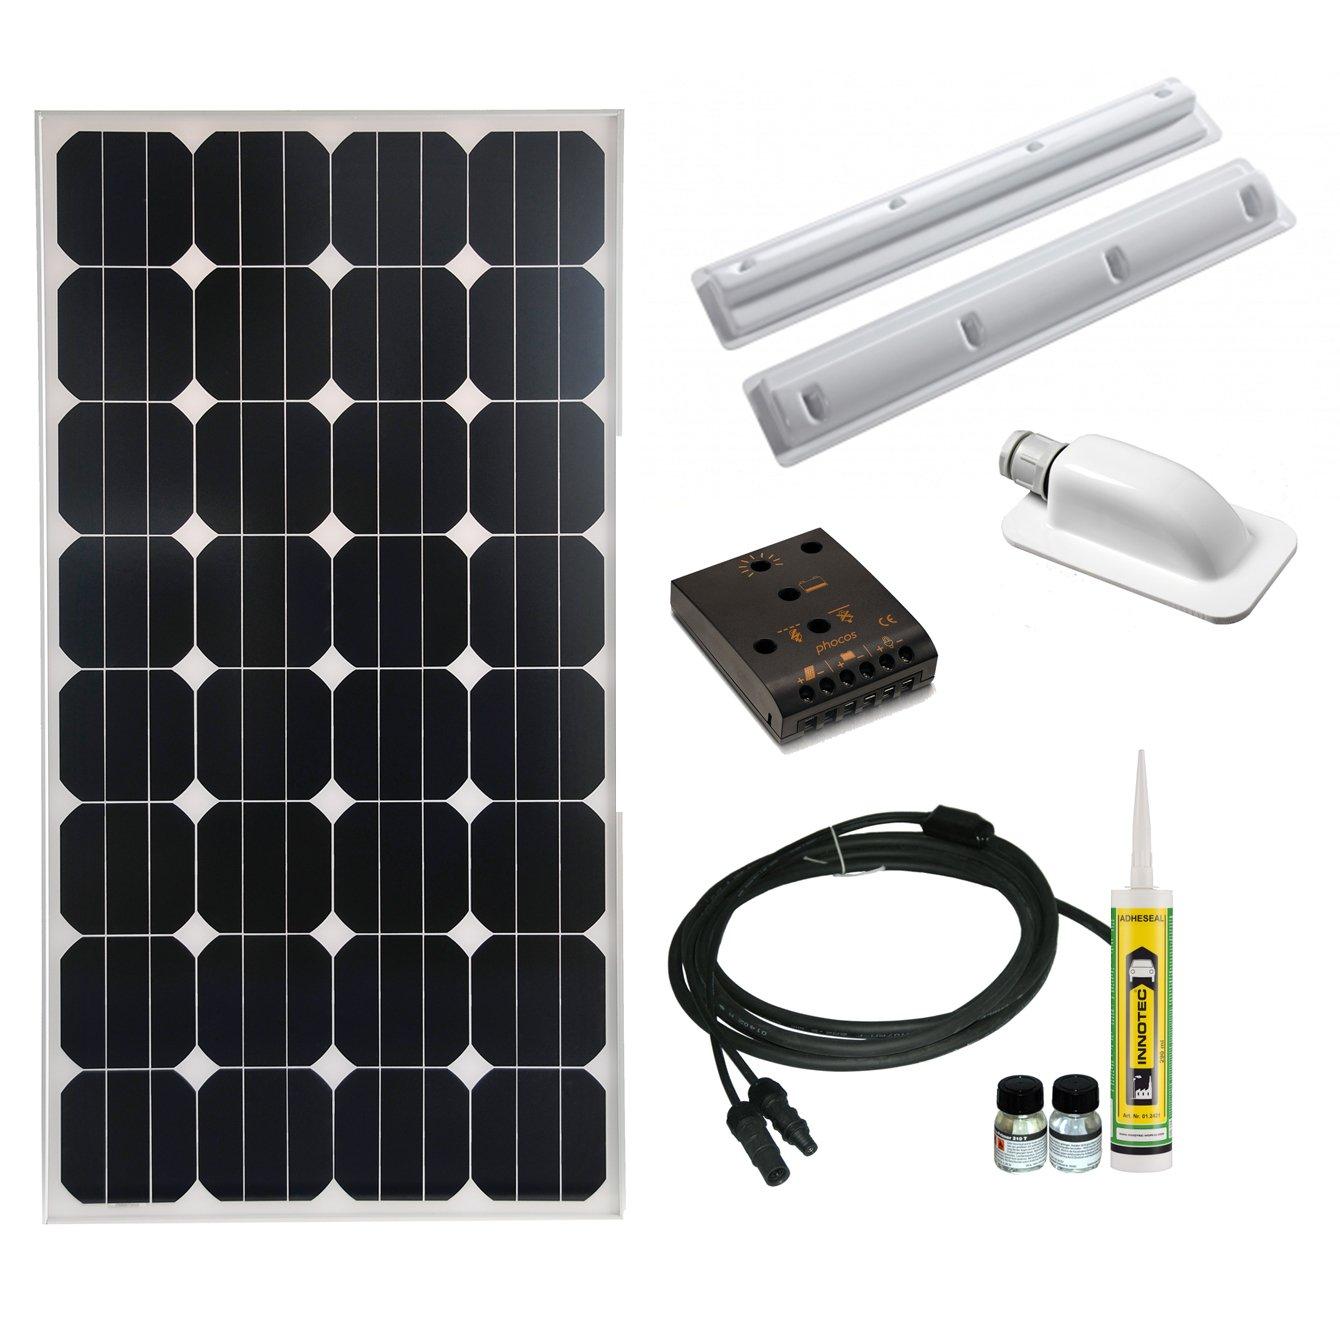 Professionelles Cleversolar 119232KPS Solarmodul Kit, 85 W